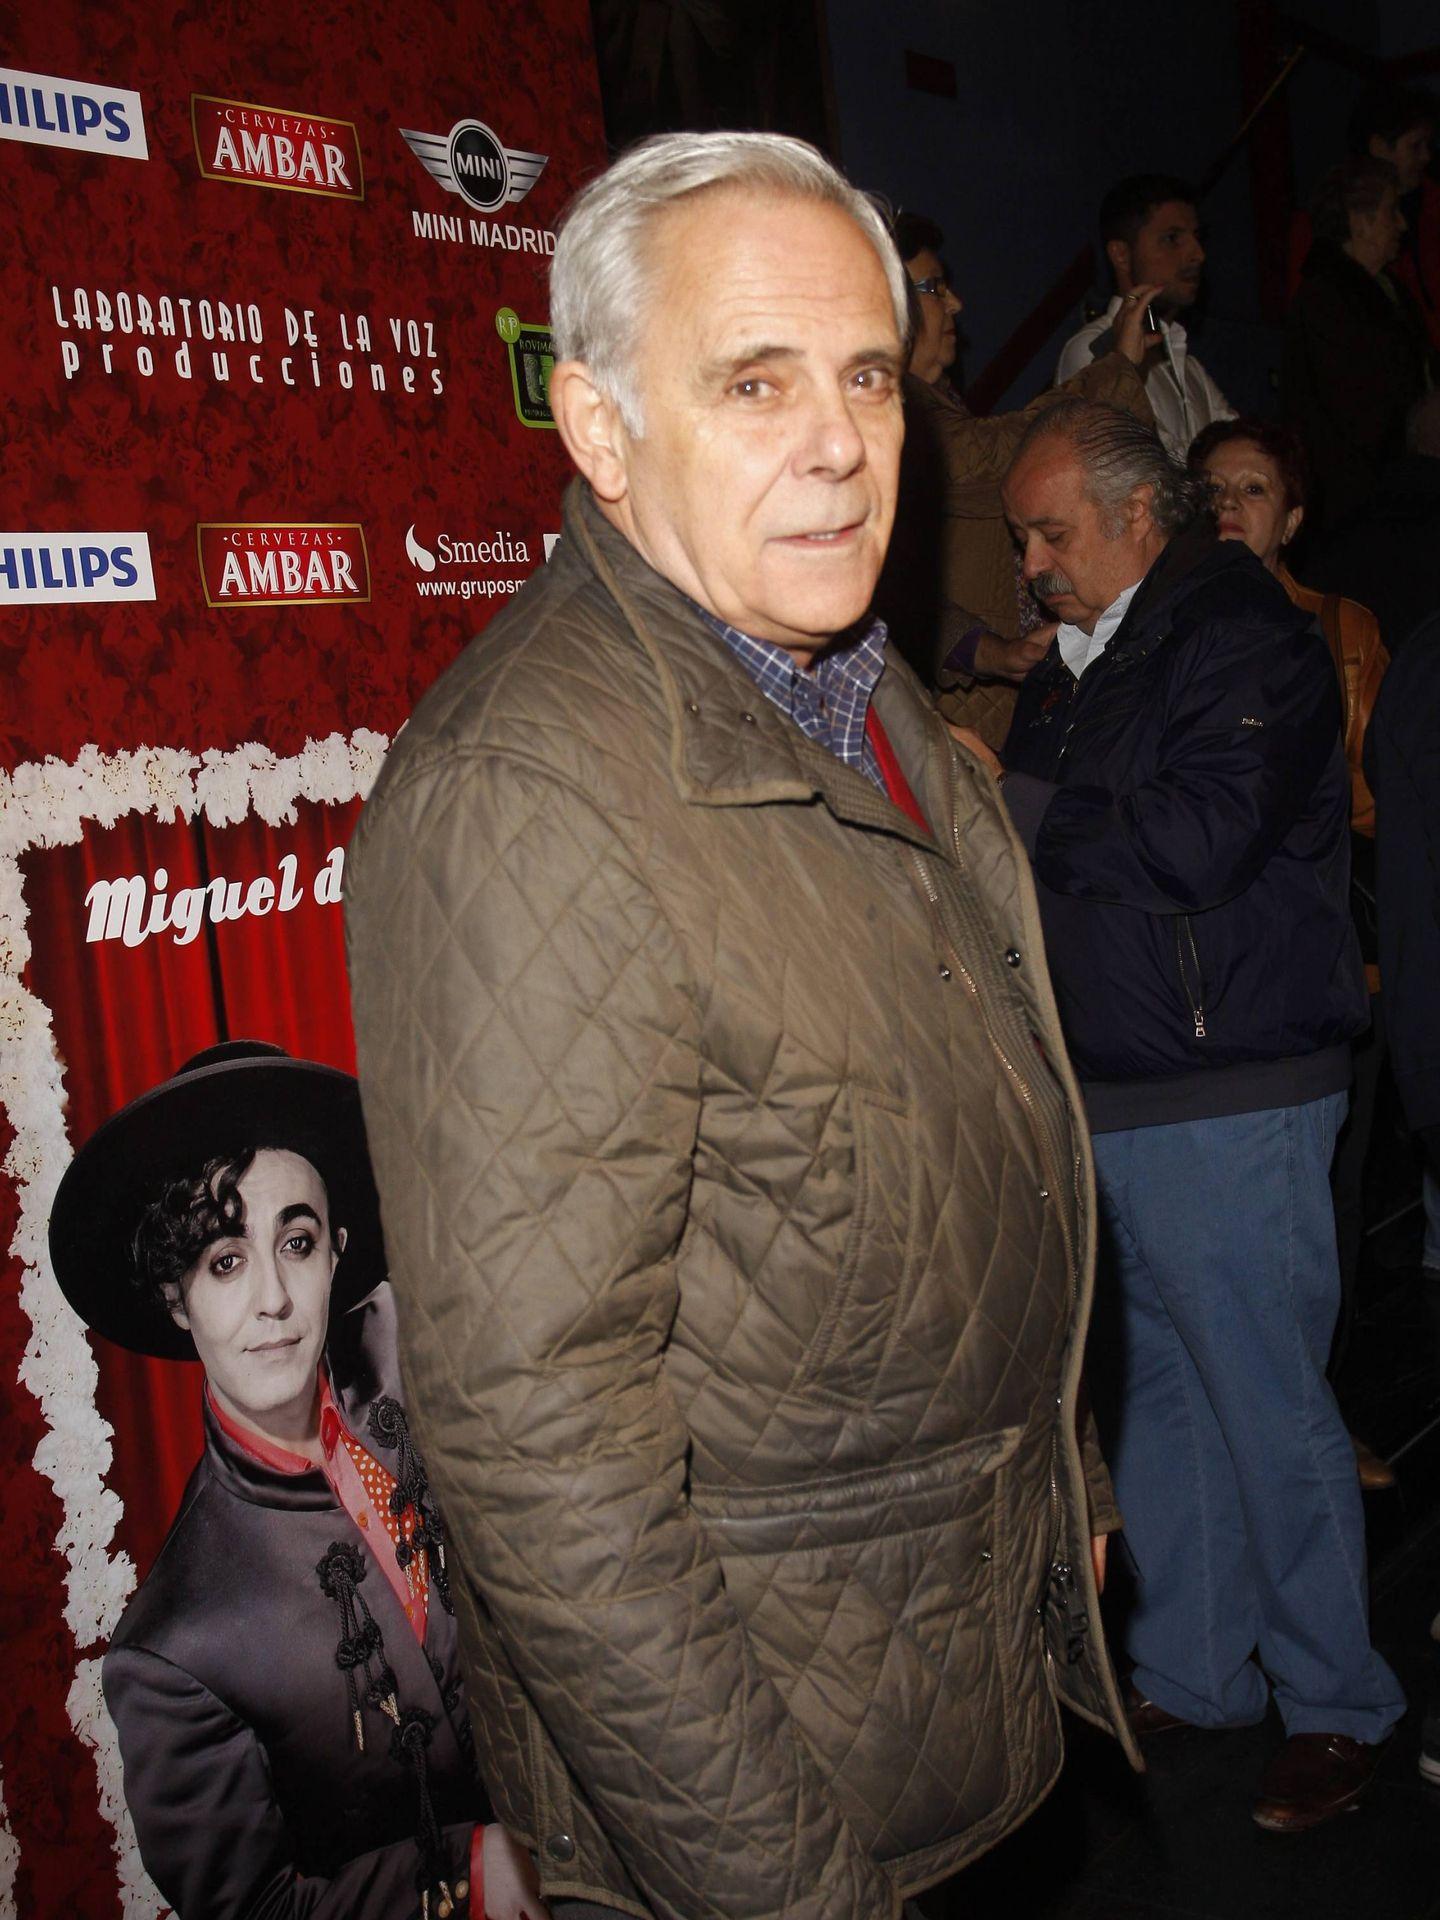 Jimmy Giménez-Arnau, en una imagen de archivo. (Cordon Press)